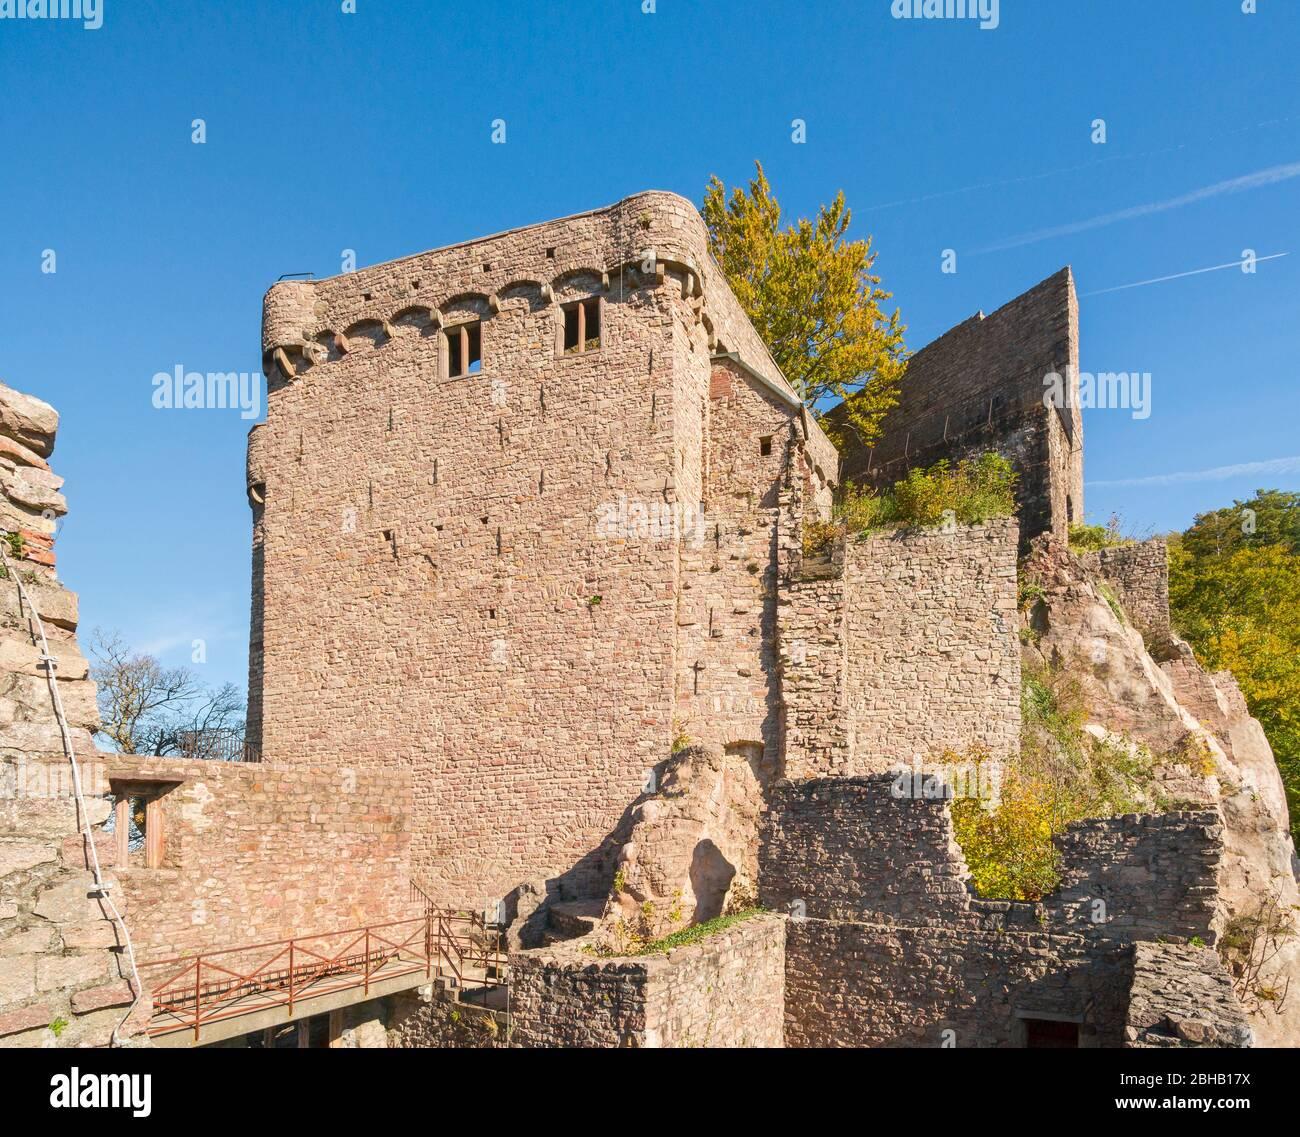 Germany, Baden-Württemberg, Baden-Baden, Hohenbaden Castle, Stock Photo